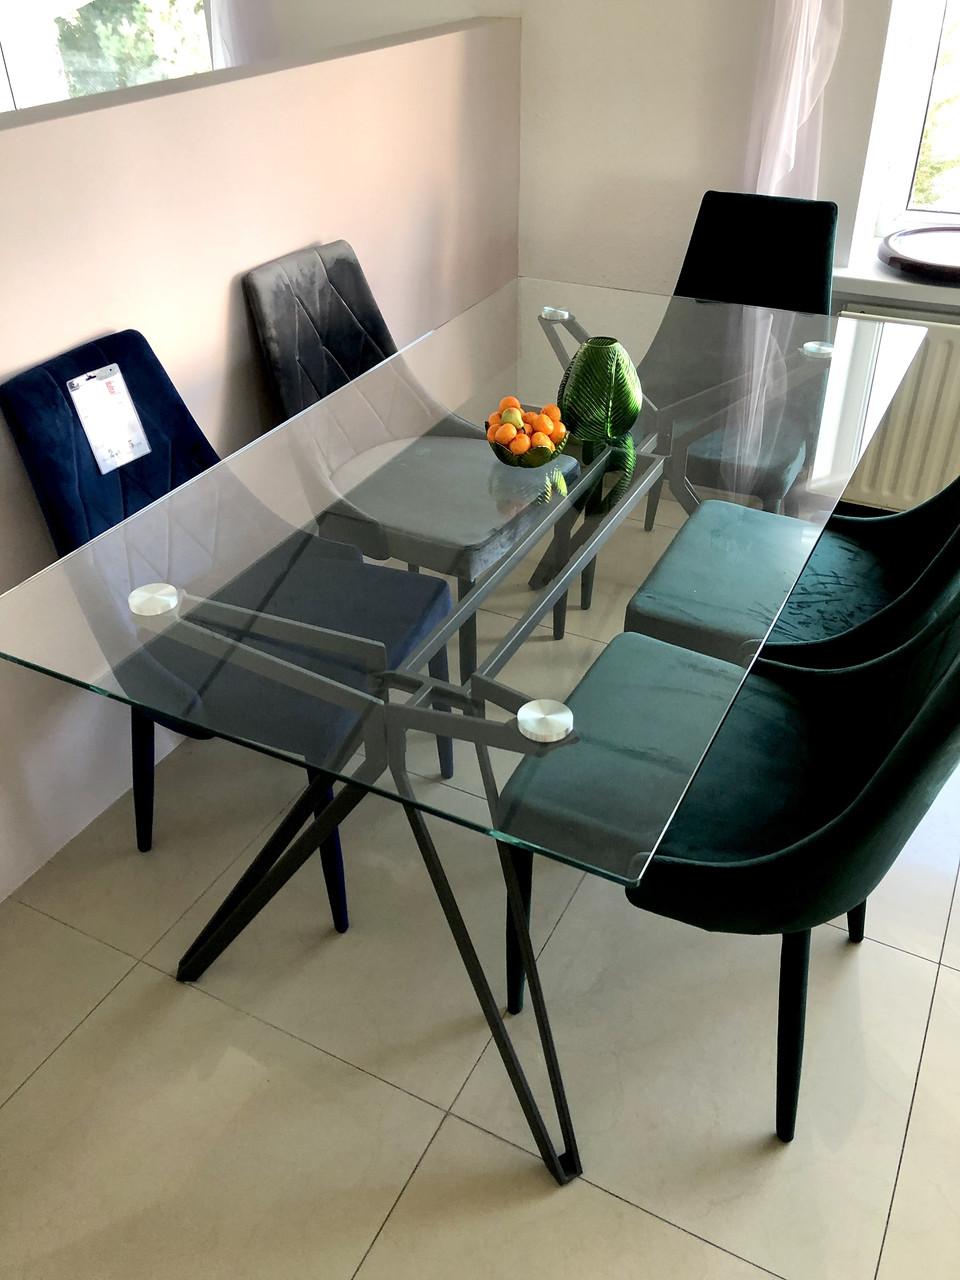 Стол обеденный Signal Tivoli 160х90 см Прозрачный (TIVOLITSZ160)